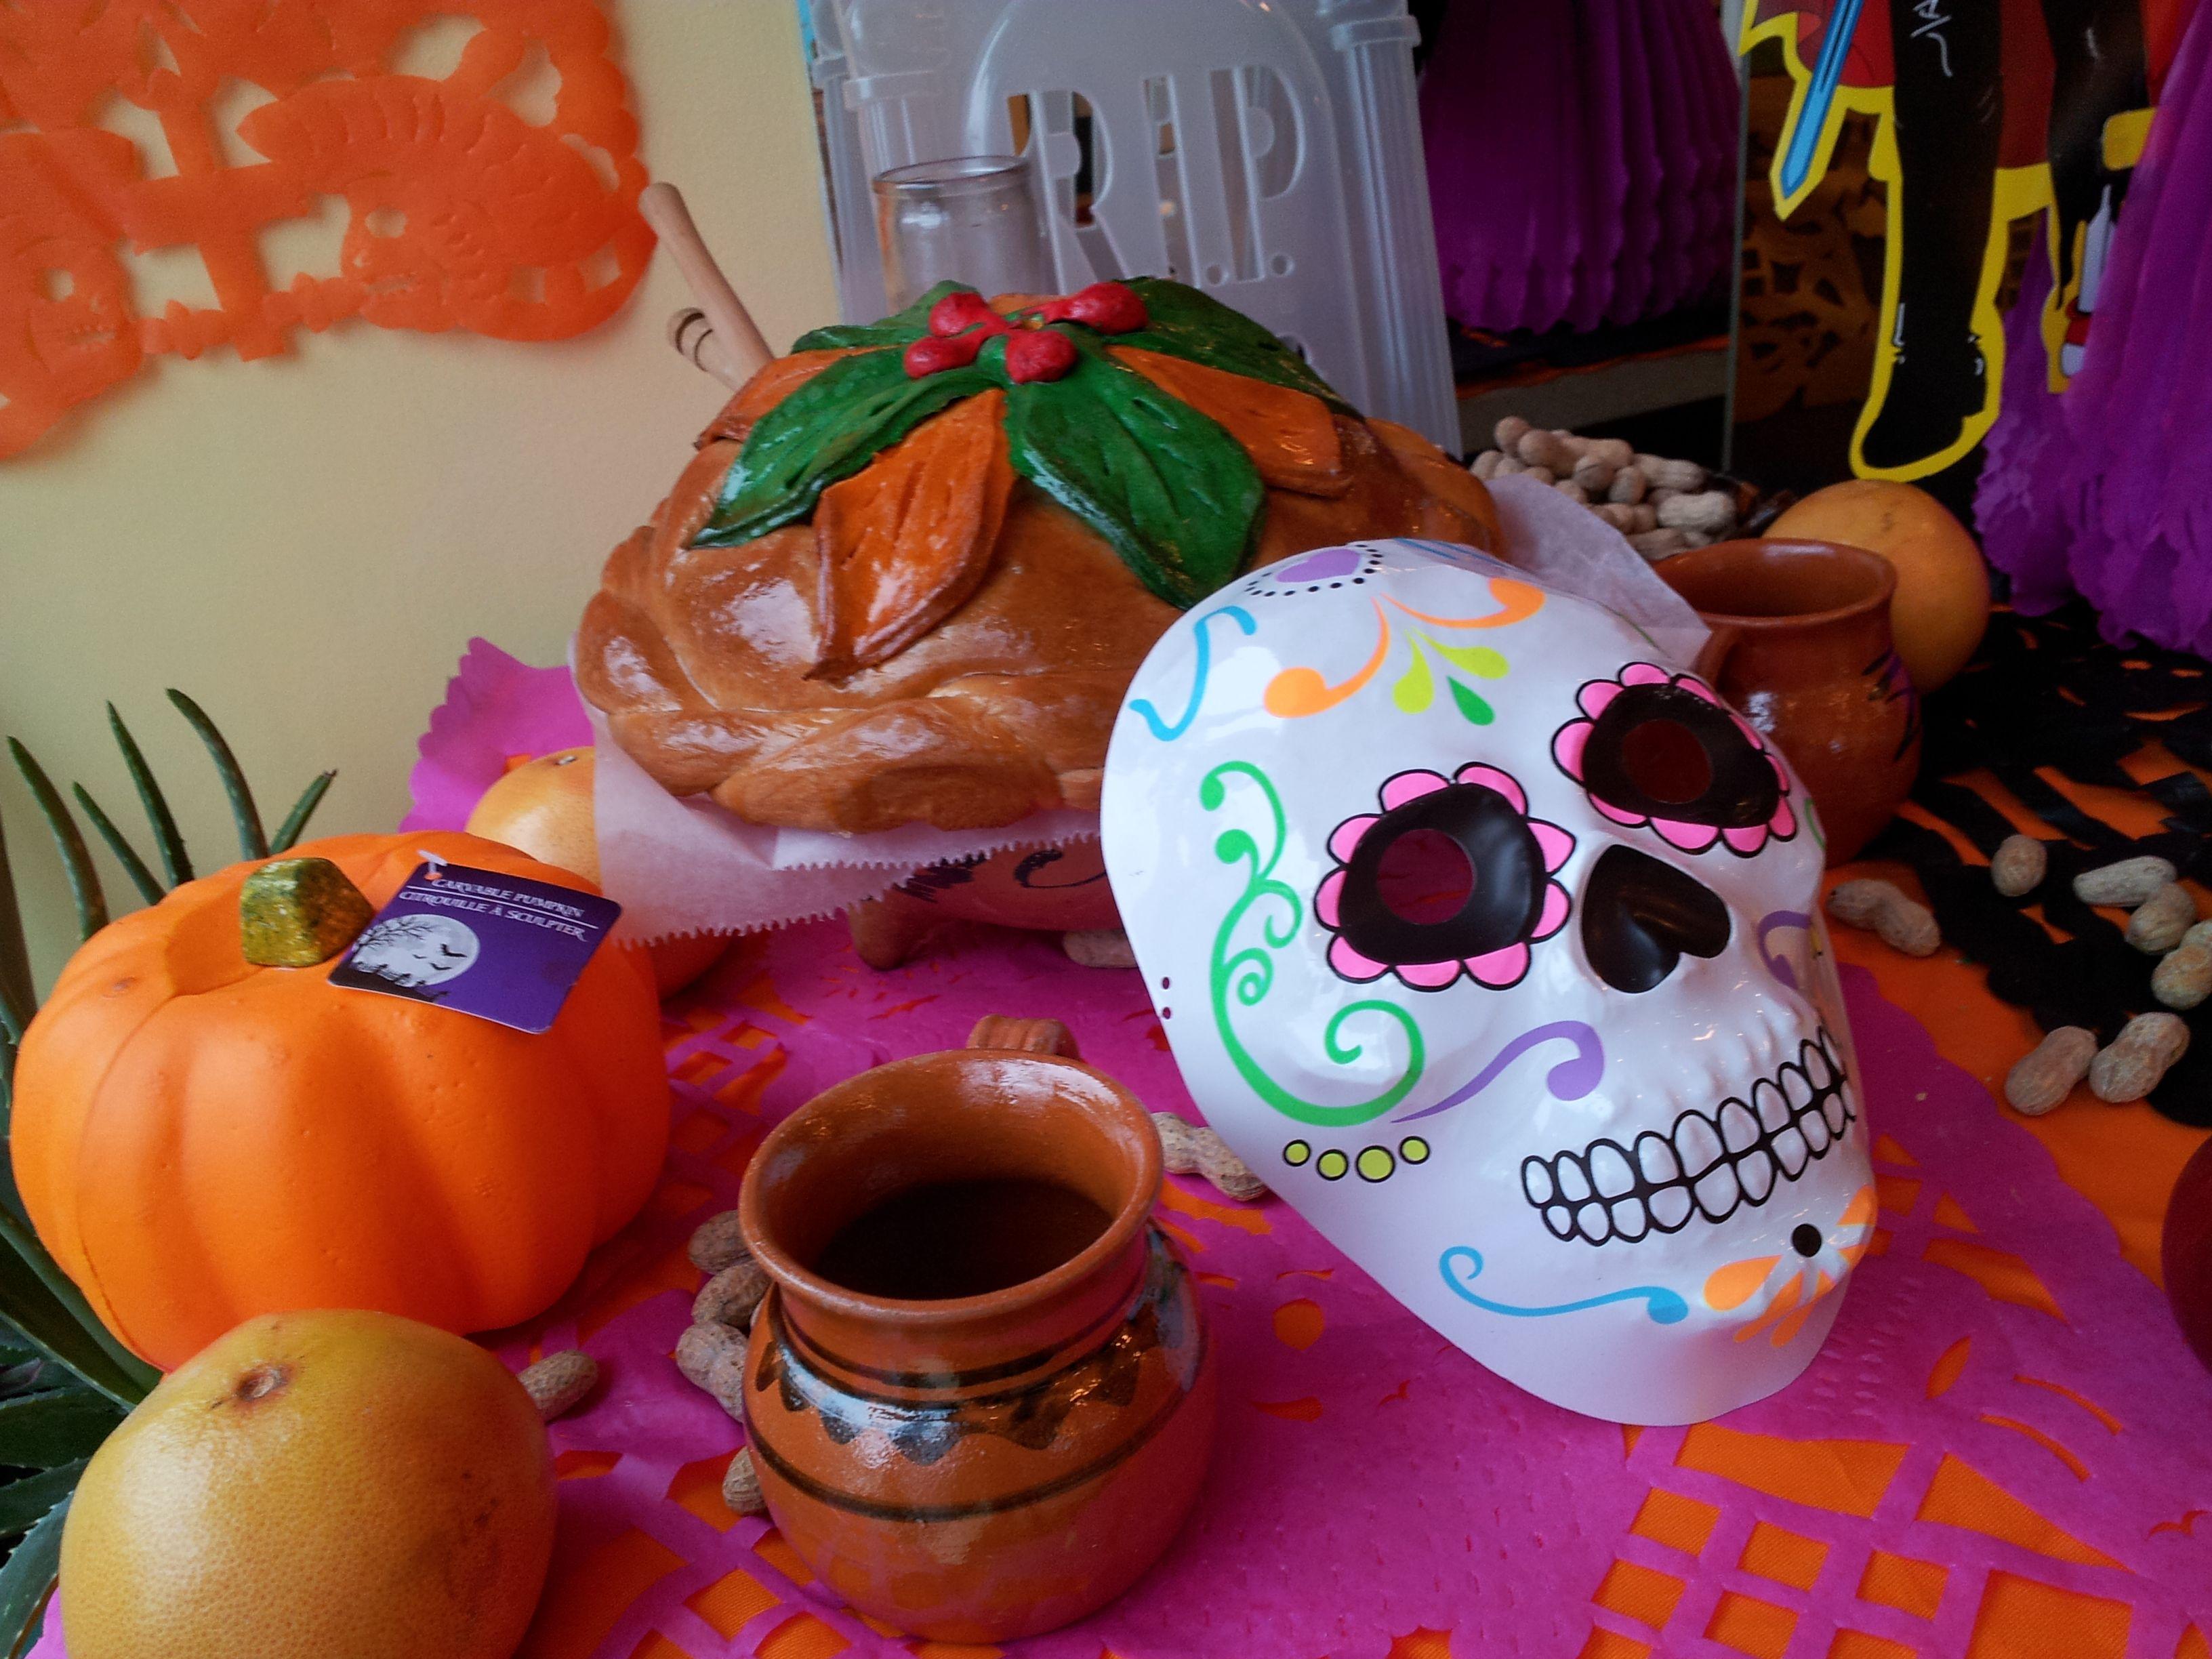 Celebrating Dia de los Muertos at La Baguette in Chicago's Andersonville neighborhood